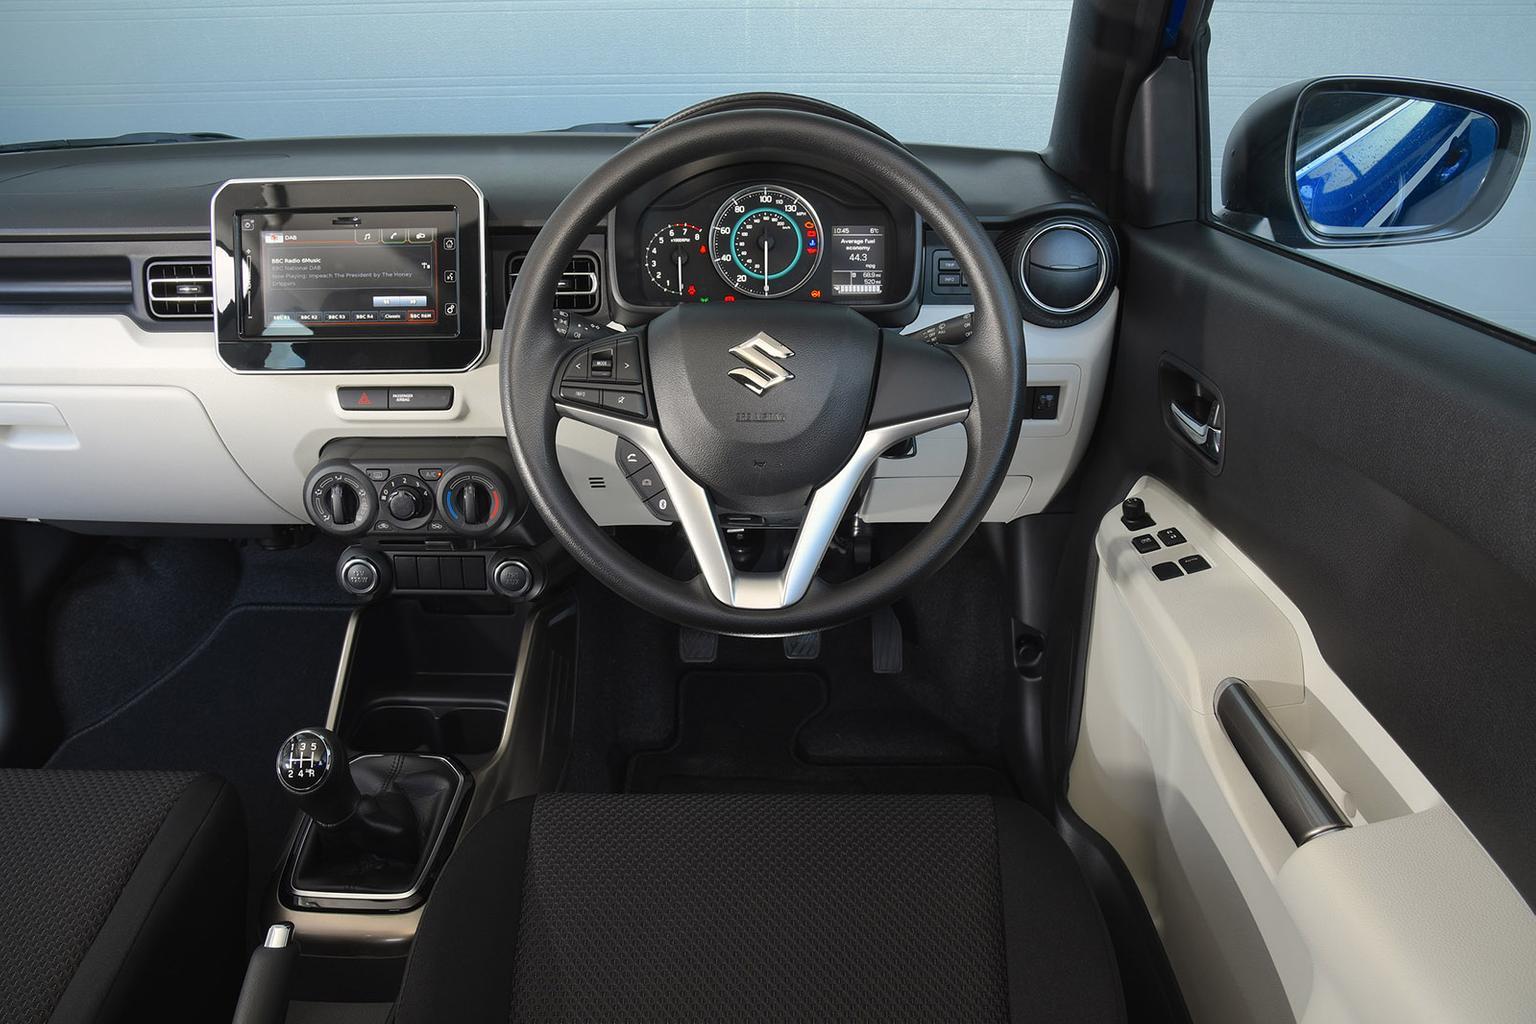 2018 Suzuki Ignis Adventure review – price, specs and release date